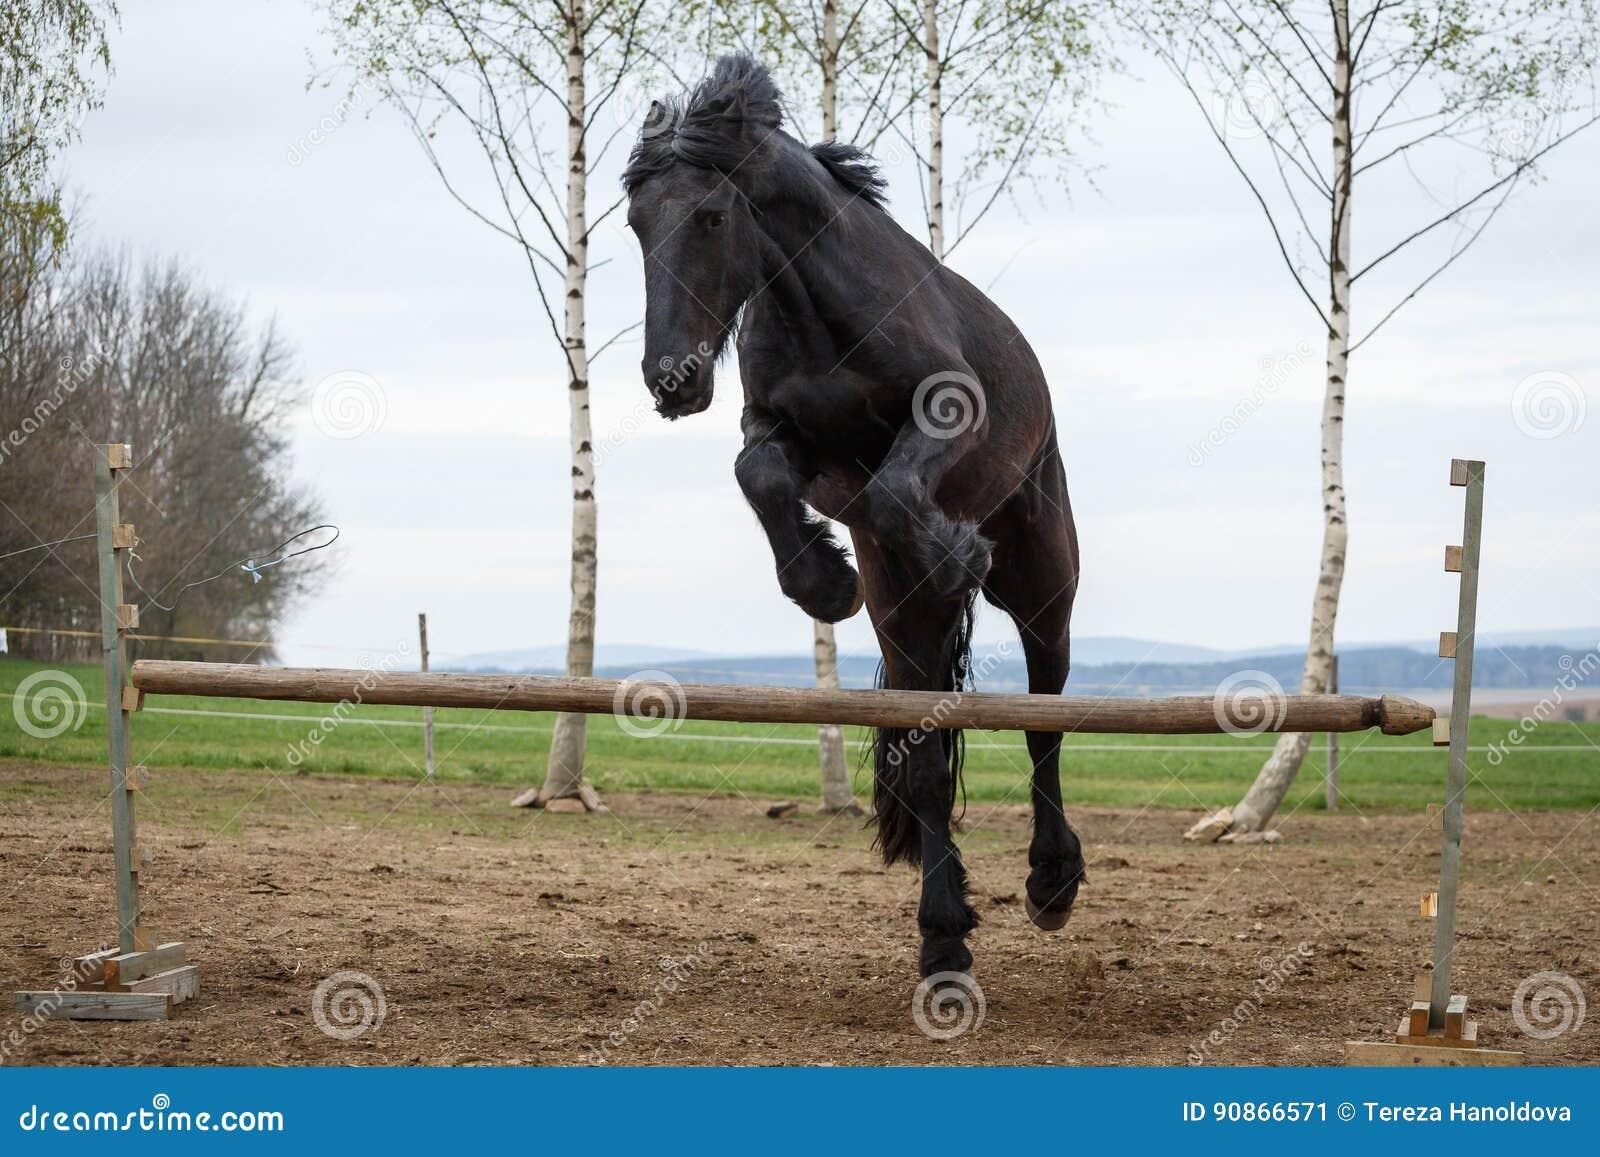 Jumping Friesian Horse Stock Image Image Of Back Hurdle 90866571